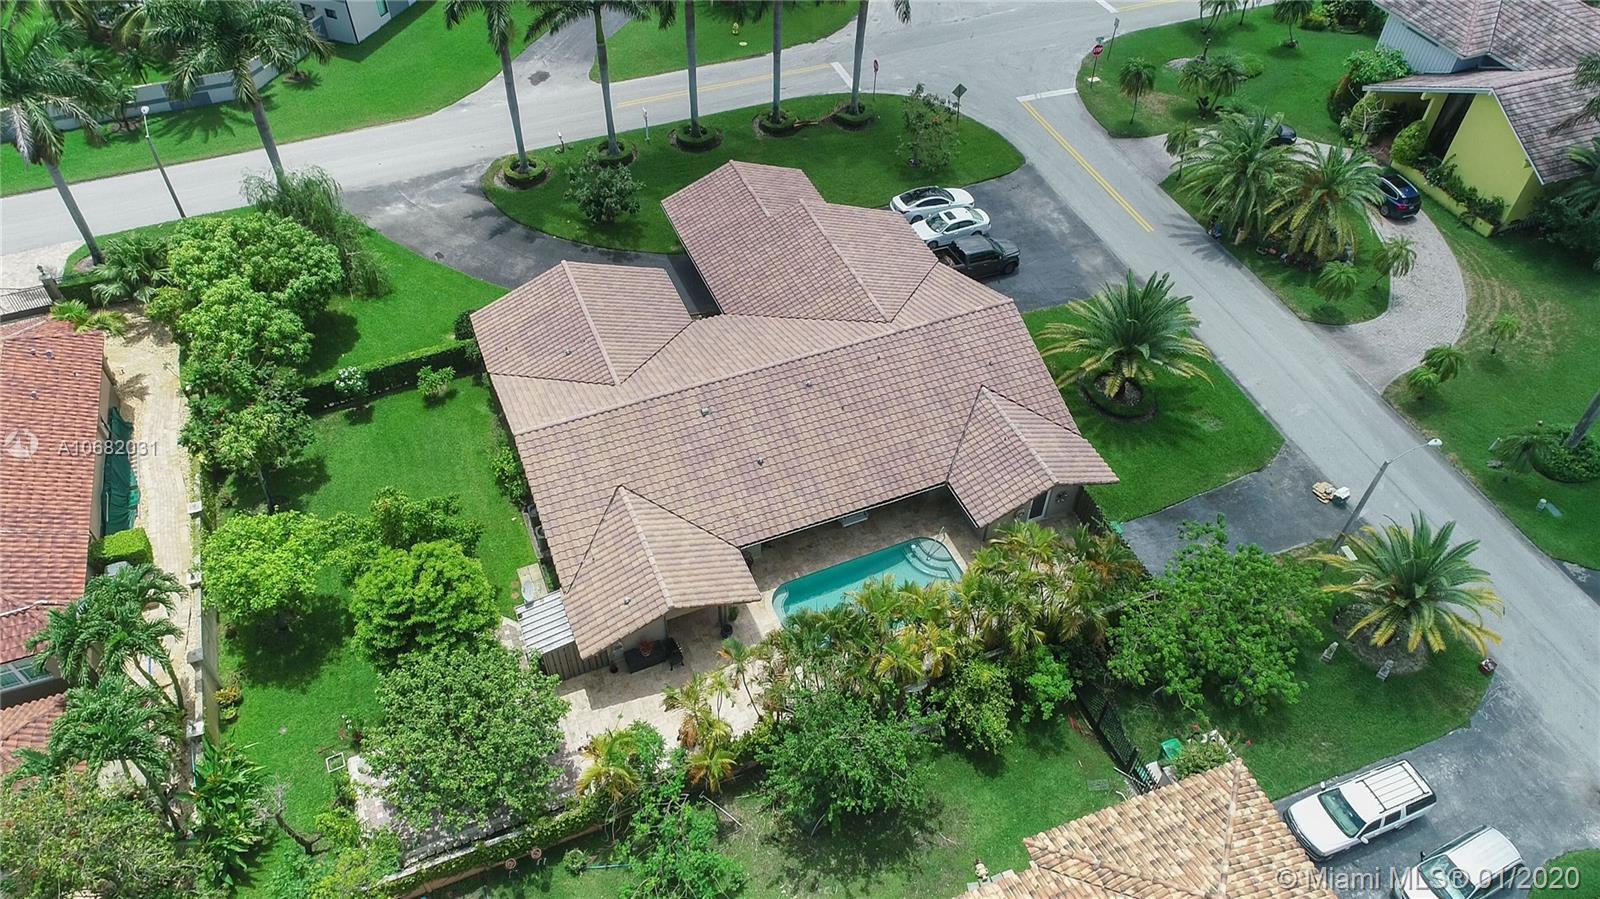 13340 NW 104th Ave, Hialeah Gardens, FL 33018